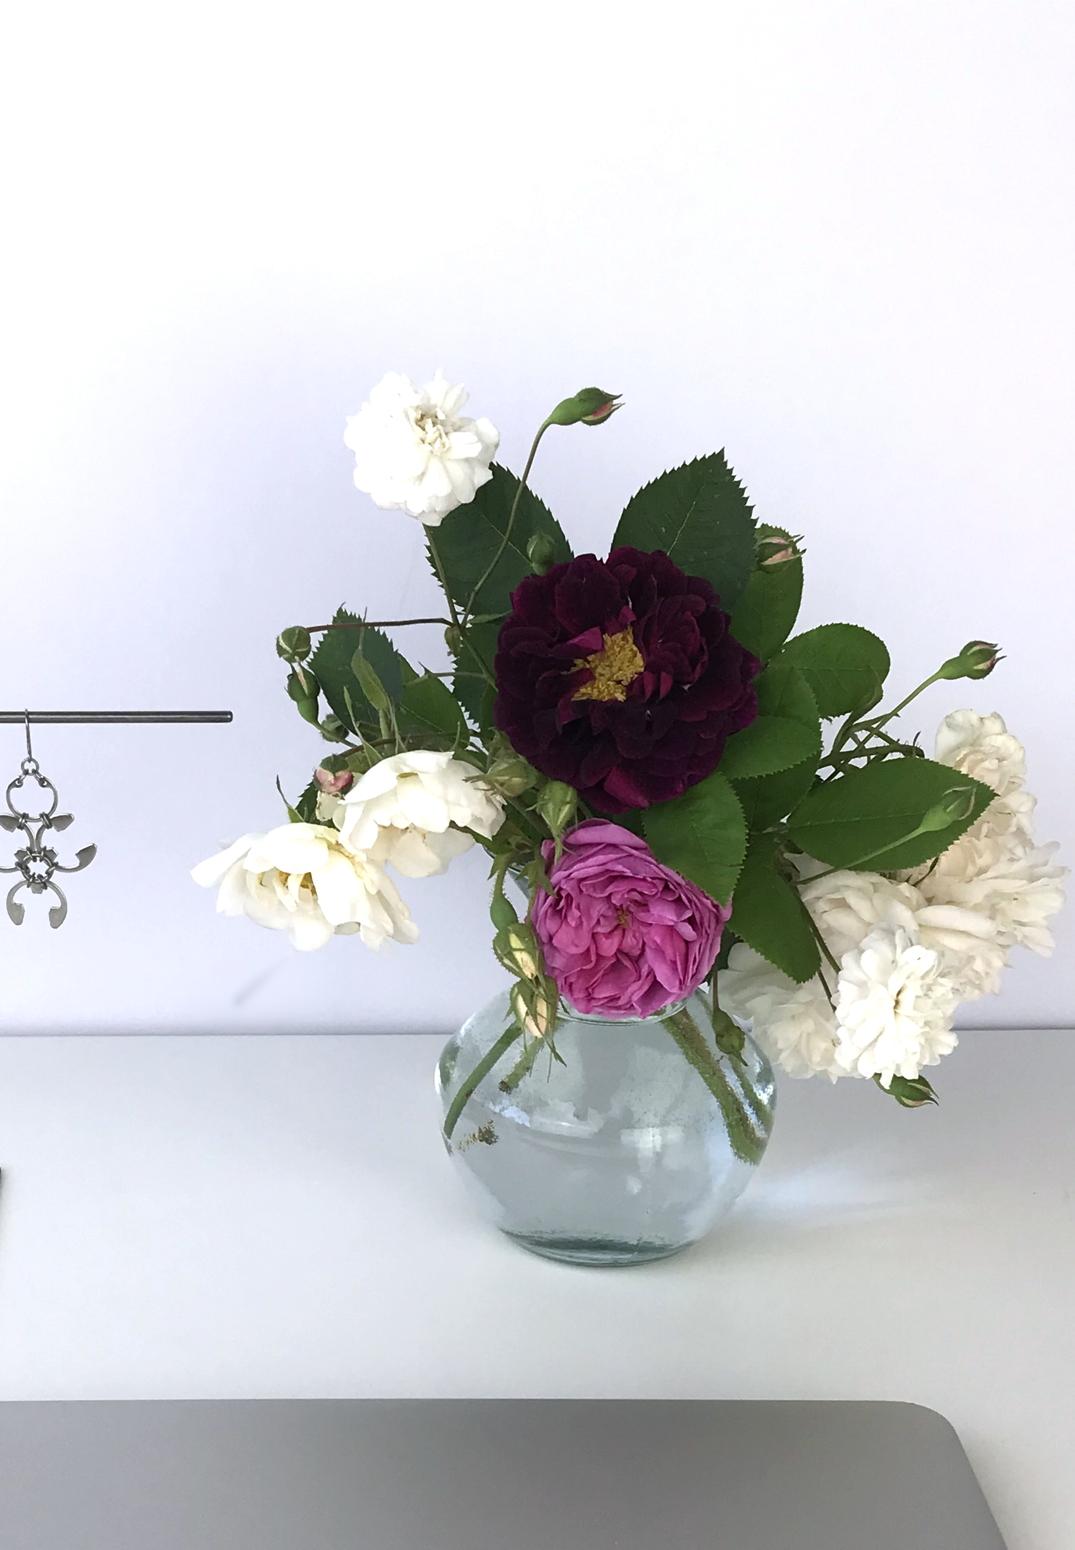 Small glass vase of old roses (Rosa alba, Rosa gallica officinalis, moss rose 'Capitaine John Ingram', & 'Felicite et Perpetue') in Wraptillion's studio.